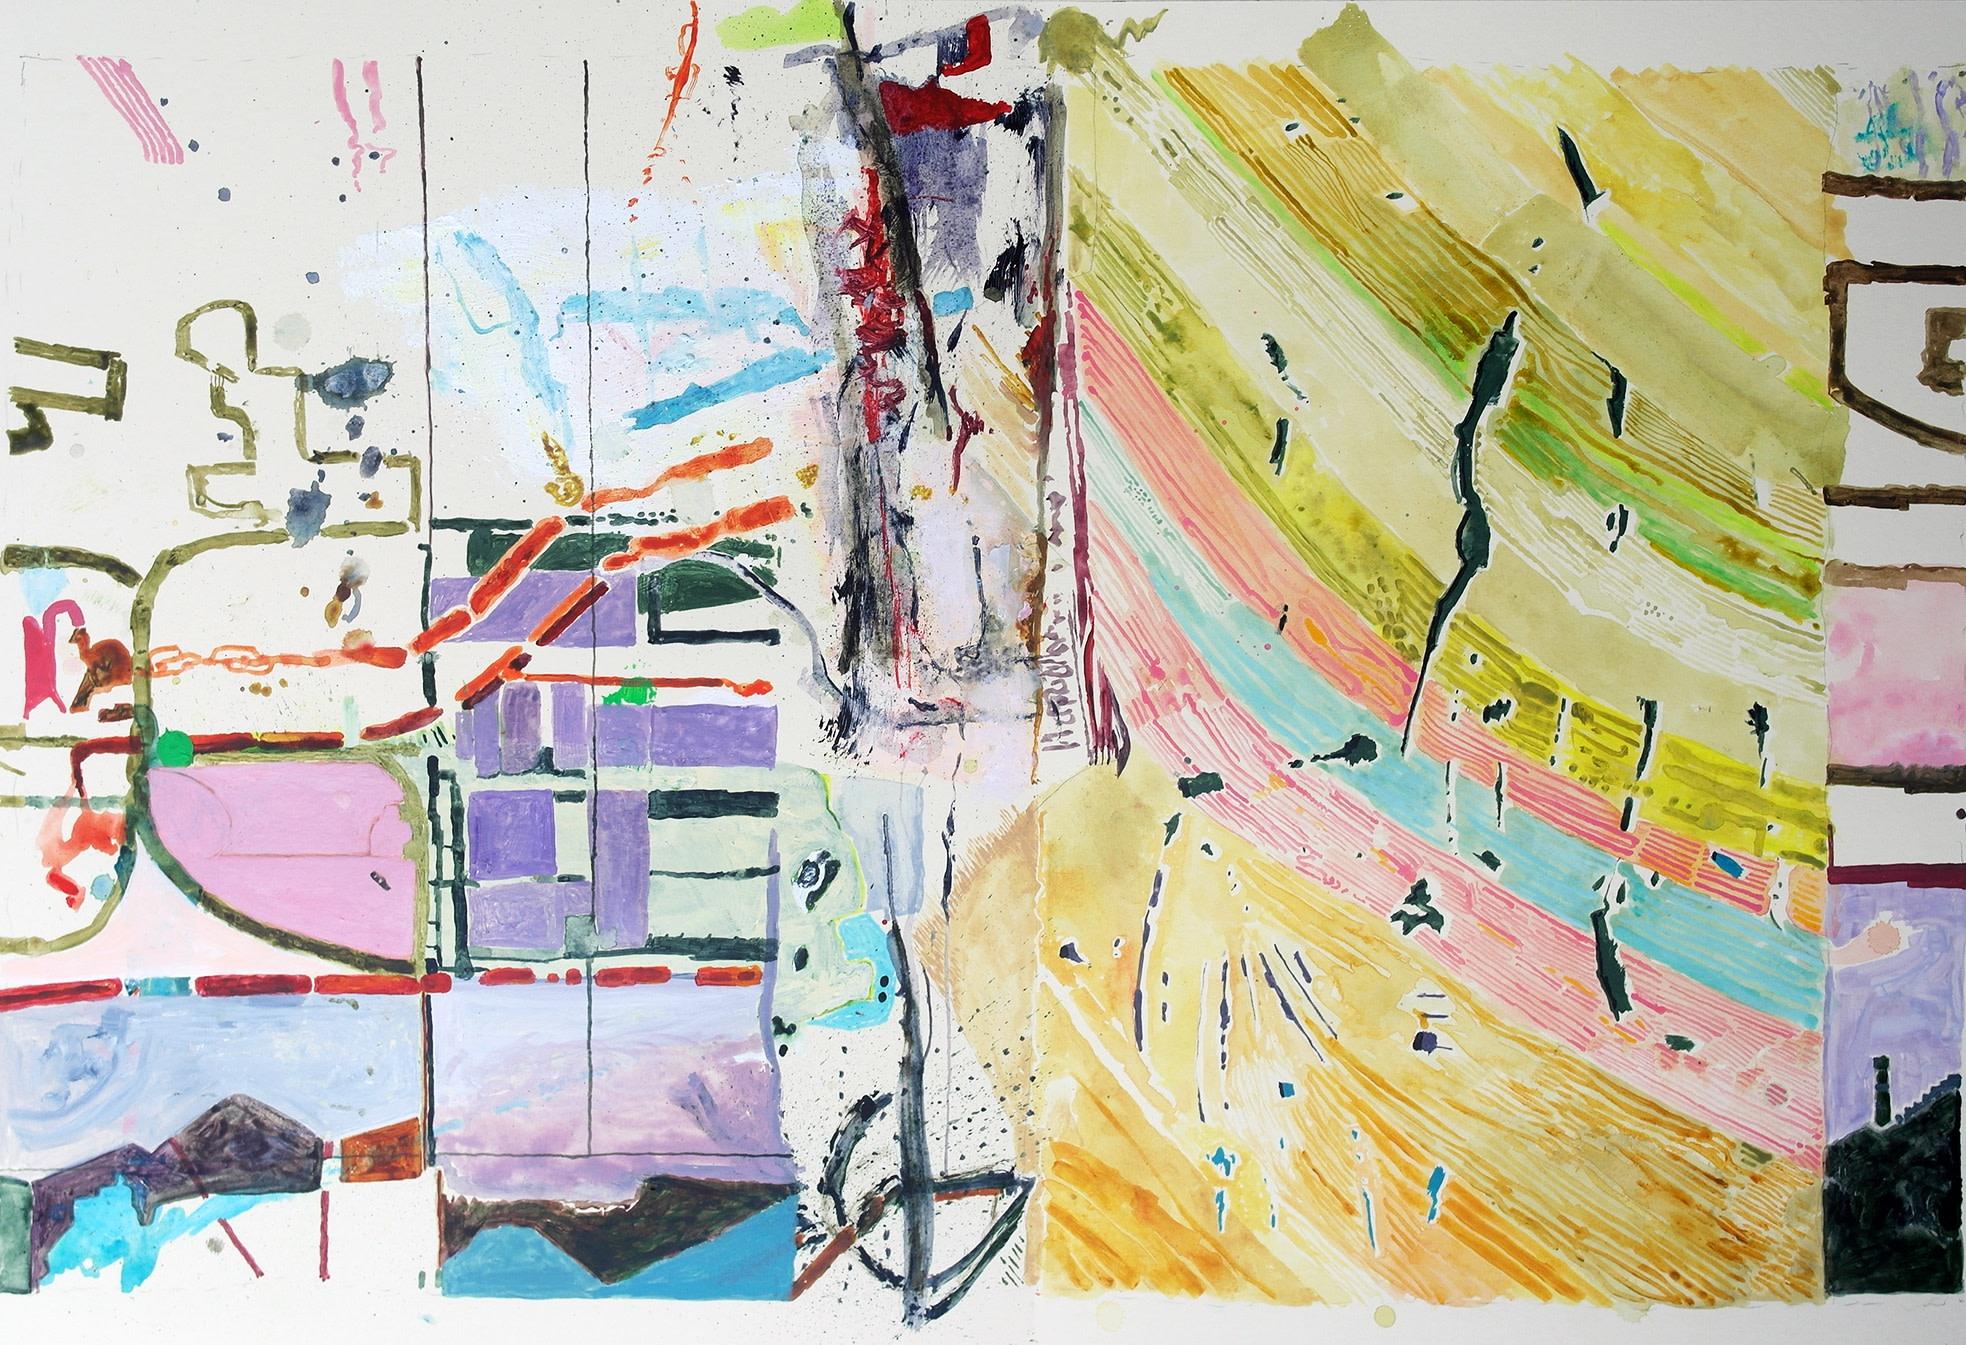 <span class=&#34;link fancybox-details-link&#34;><a href=&#34;/artists/88-iain-nicholls/works/10547-iain-nicholls-cp-resurrection-2/&#34;>View Detail Page</a></span><div class=&#34;artist&#34;><span class=&#34;artist&#34;><strong>Iain Nicholls</strong></span></div><div class=&#34;title&#34;><em>CP Resurrection 2</em></div><div class=&#34;medium&#34;>acrylic</div><div class=&#34;price&#34;>£800.00</div>